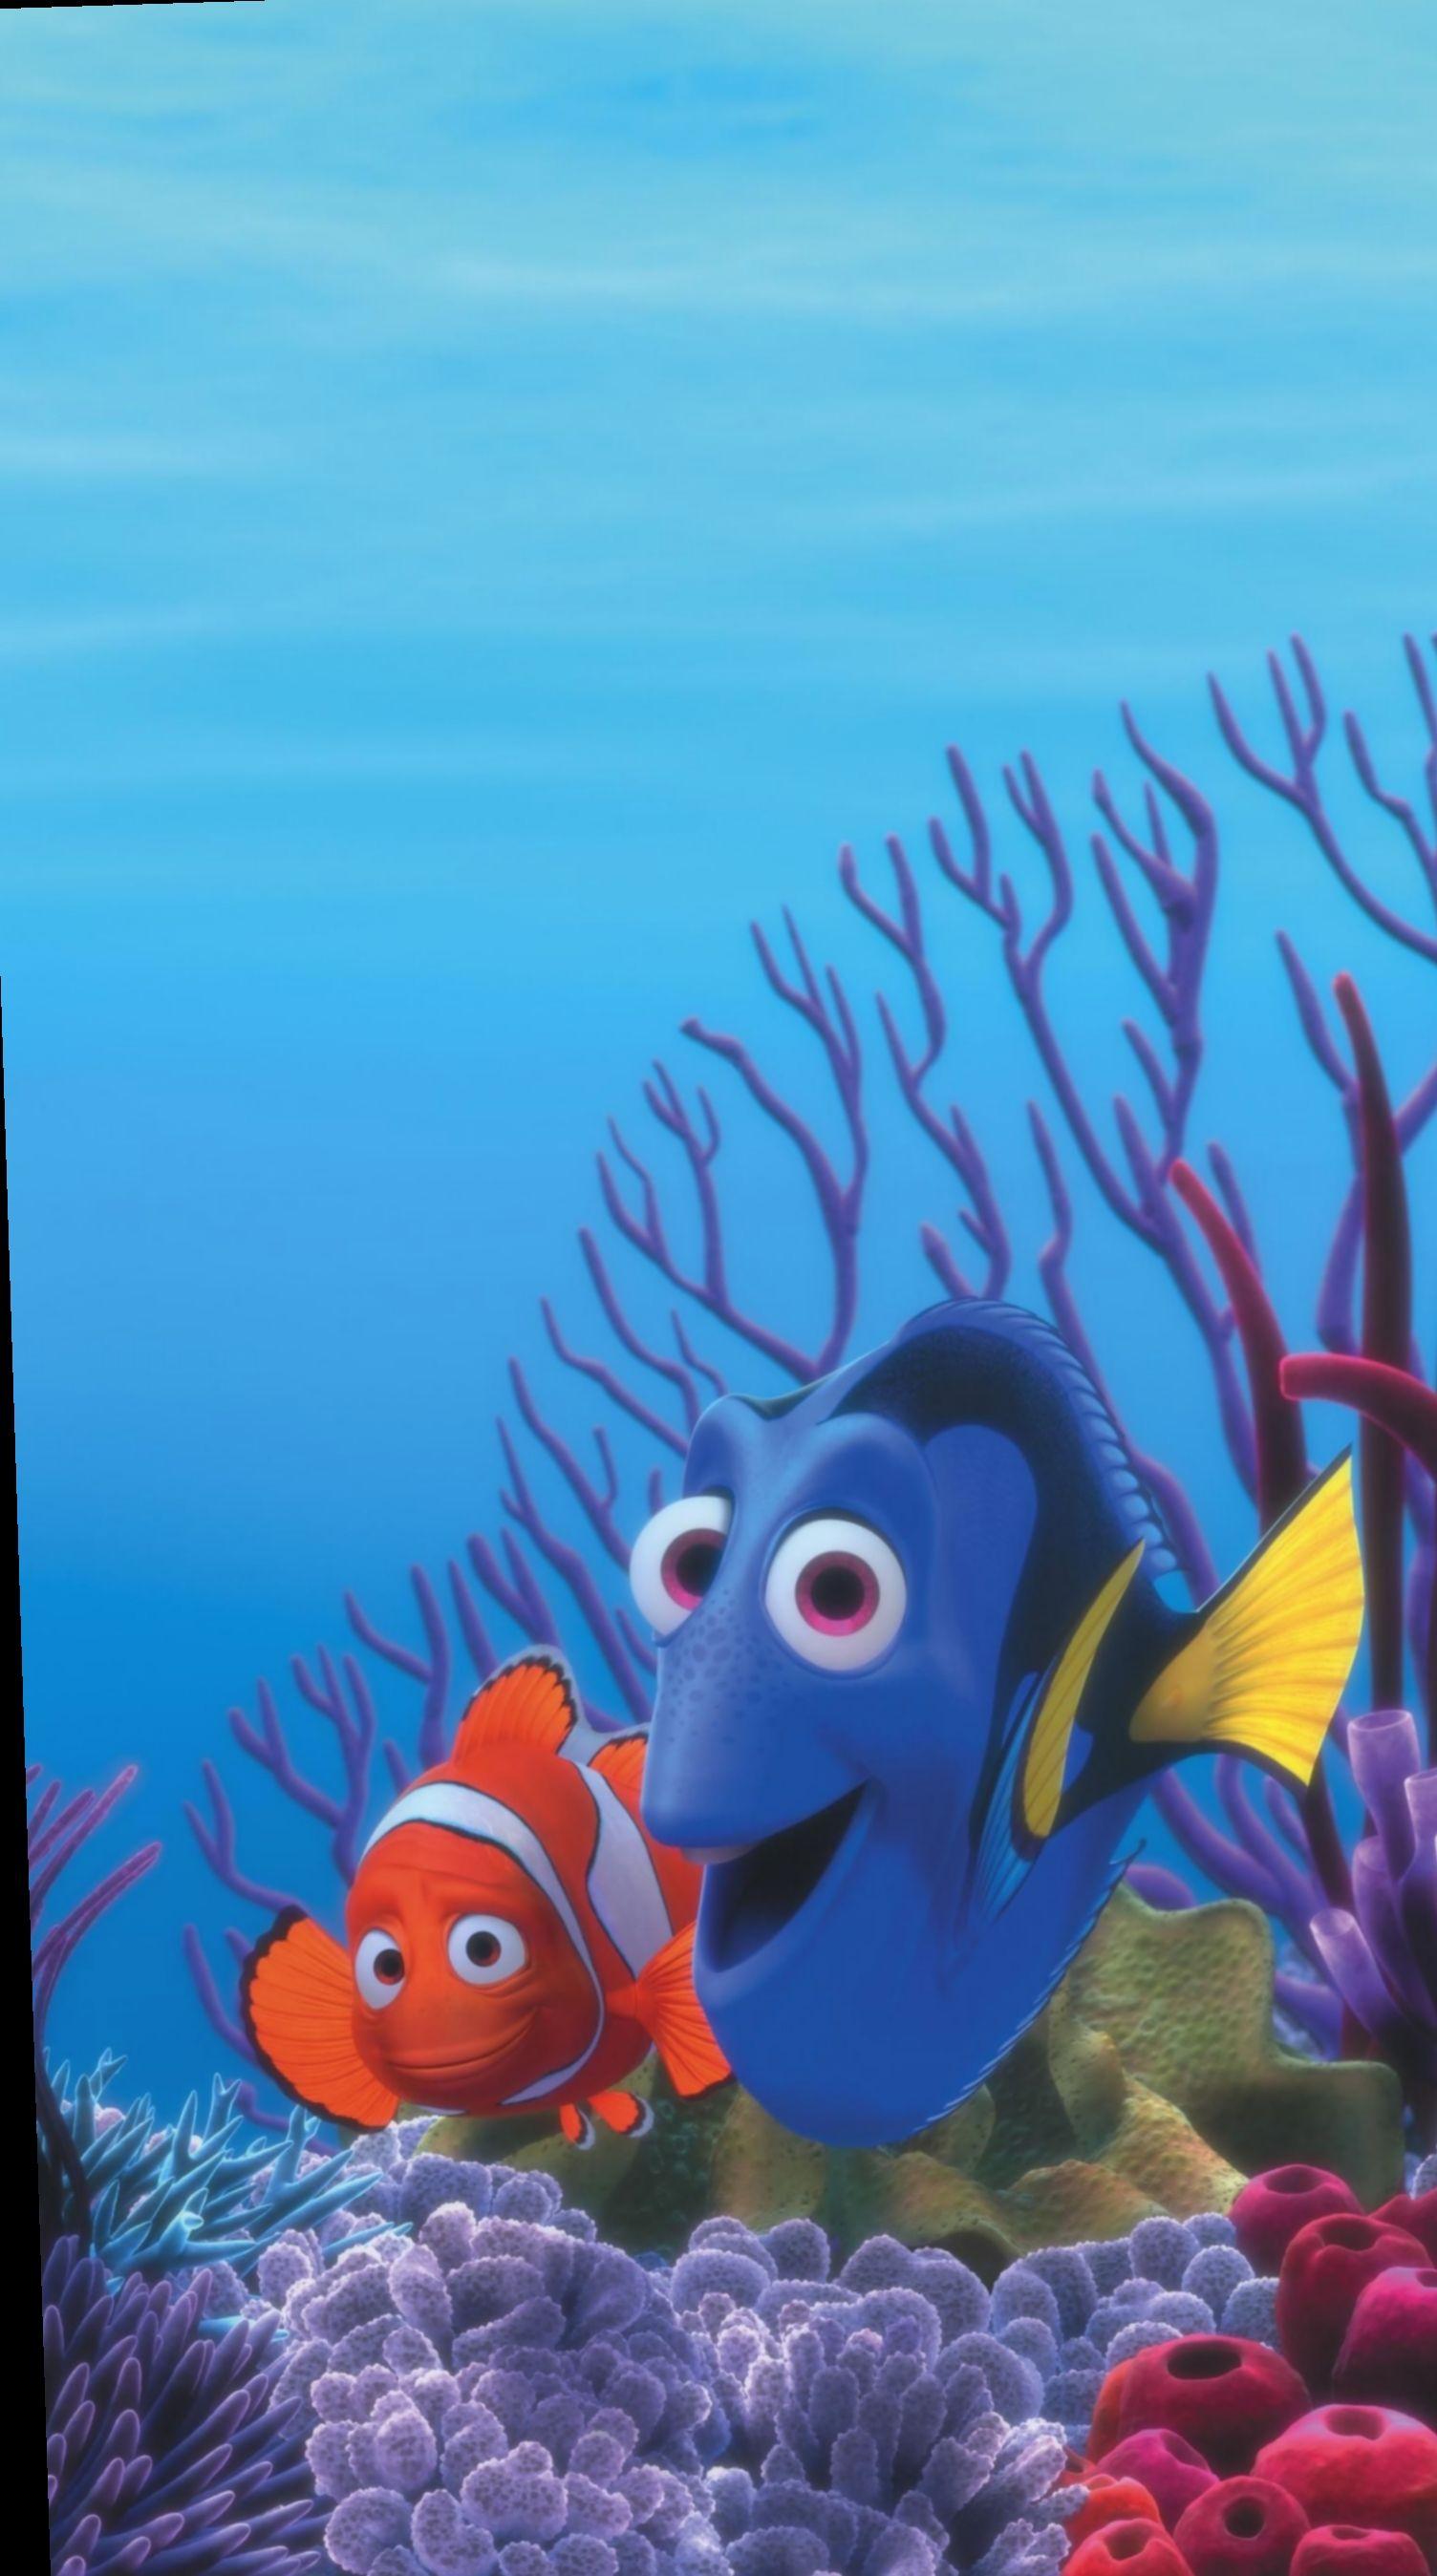 21 Cute Wallpapers Disney Finding Nemo Disney Wallpaper Disney Finding Nemo Cute Disney Wallpaper